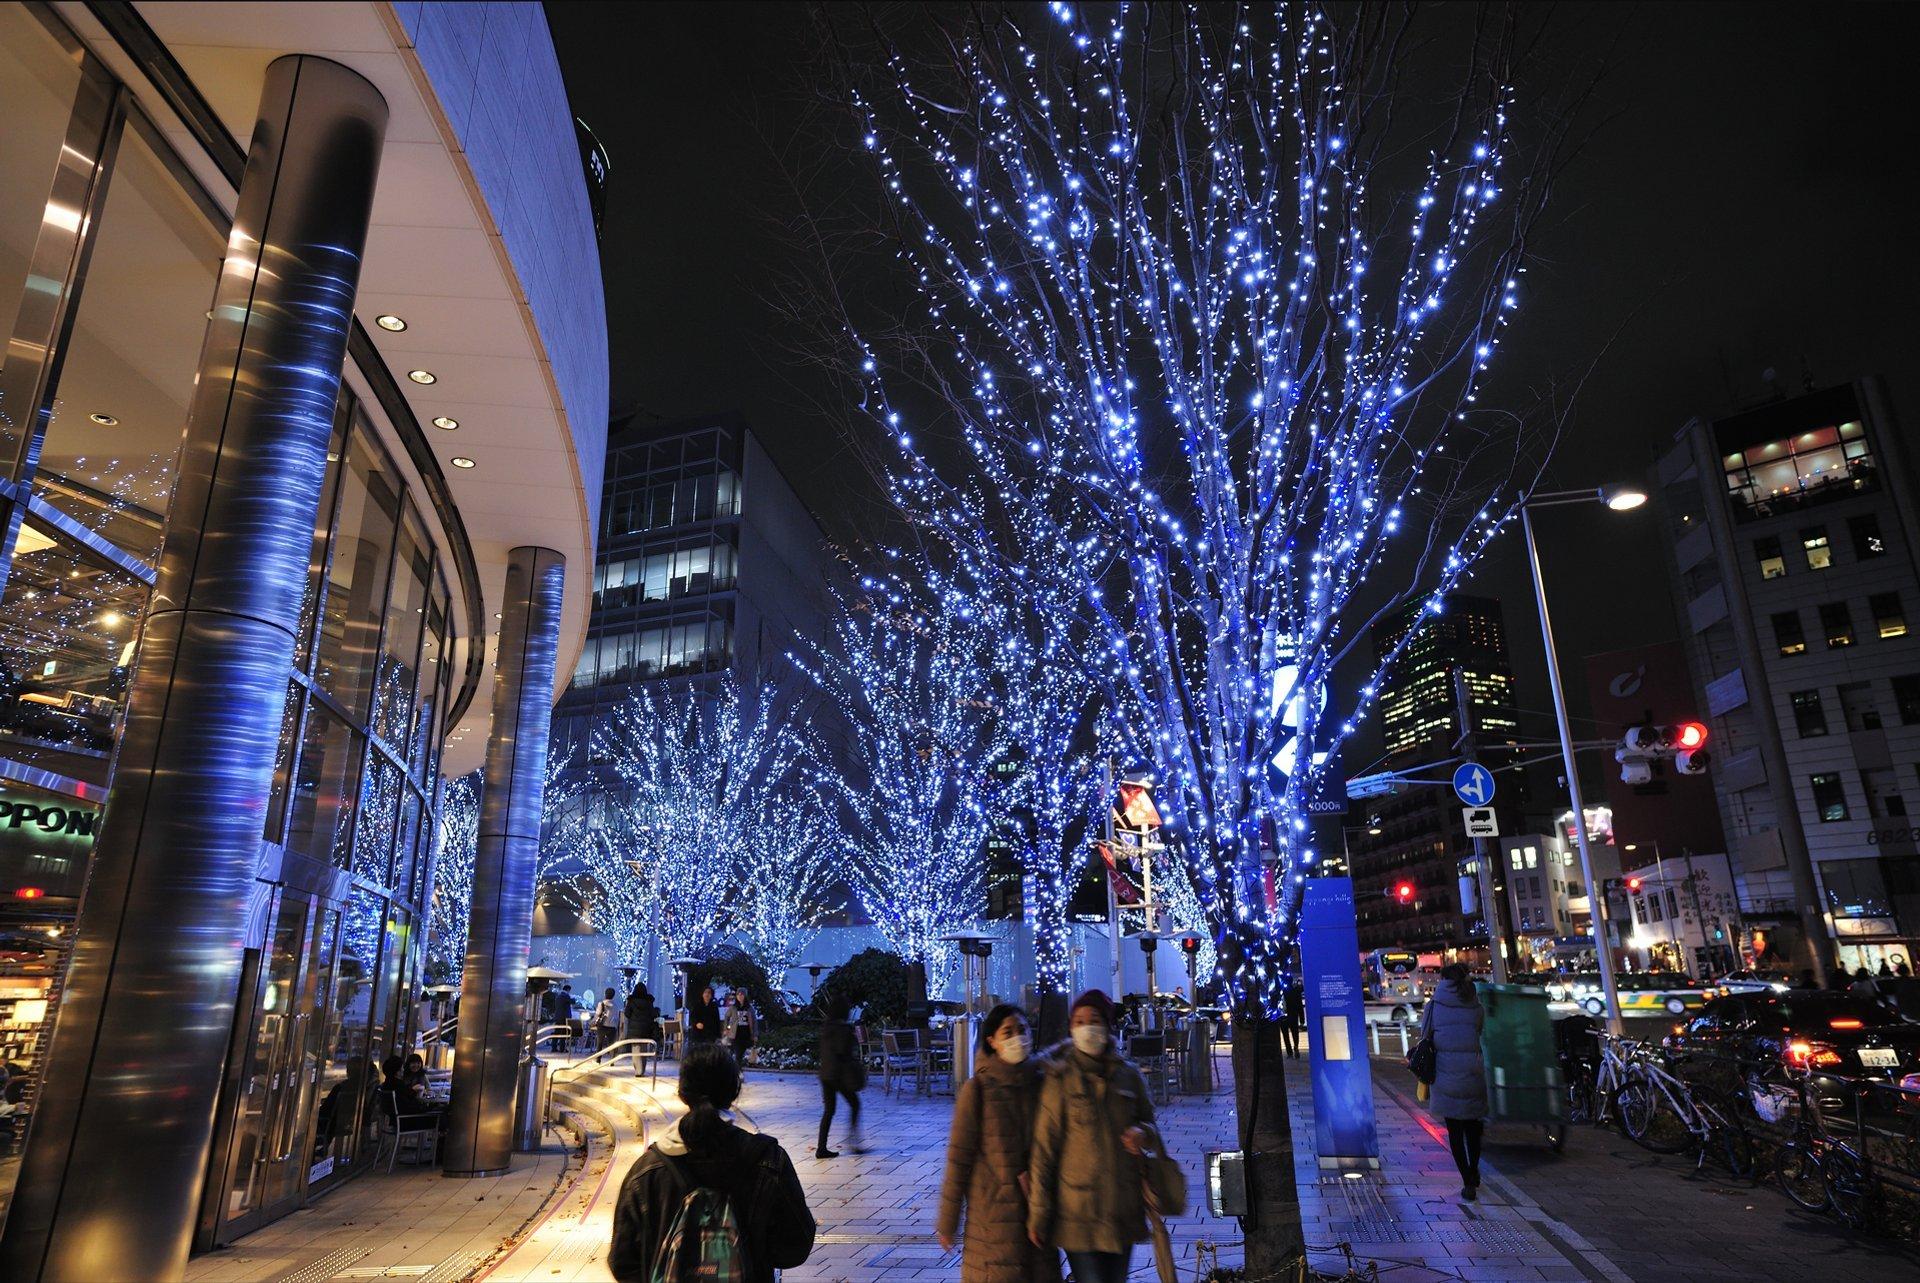 Christmas light show at Roppongi Hills, Tokyo 2020